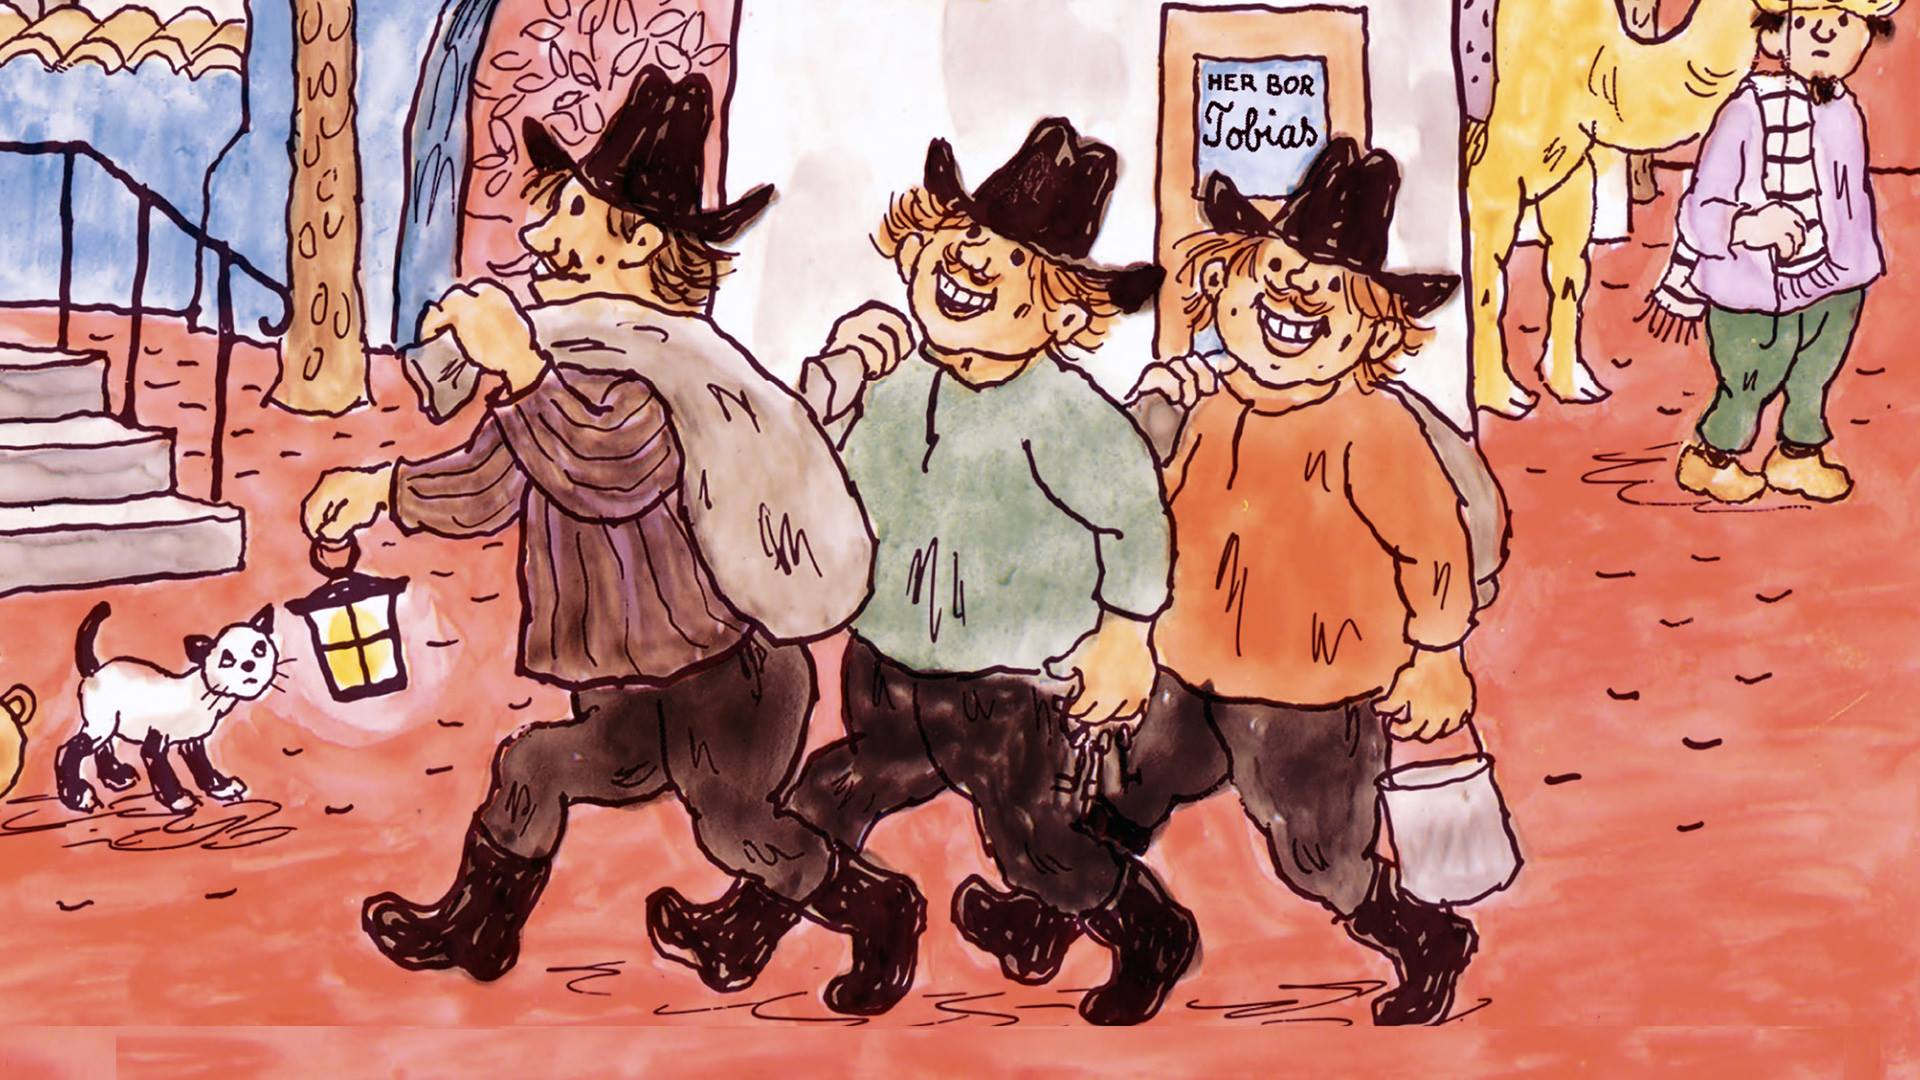 Folk og røvere i Kardemomme by - Riksteatret